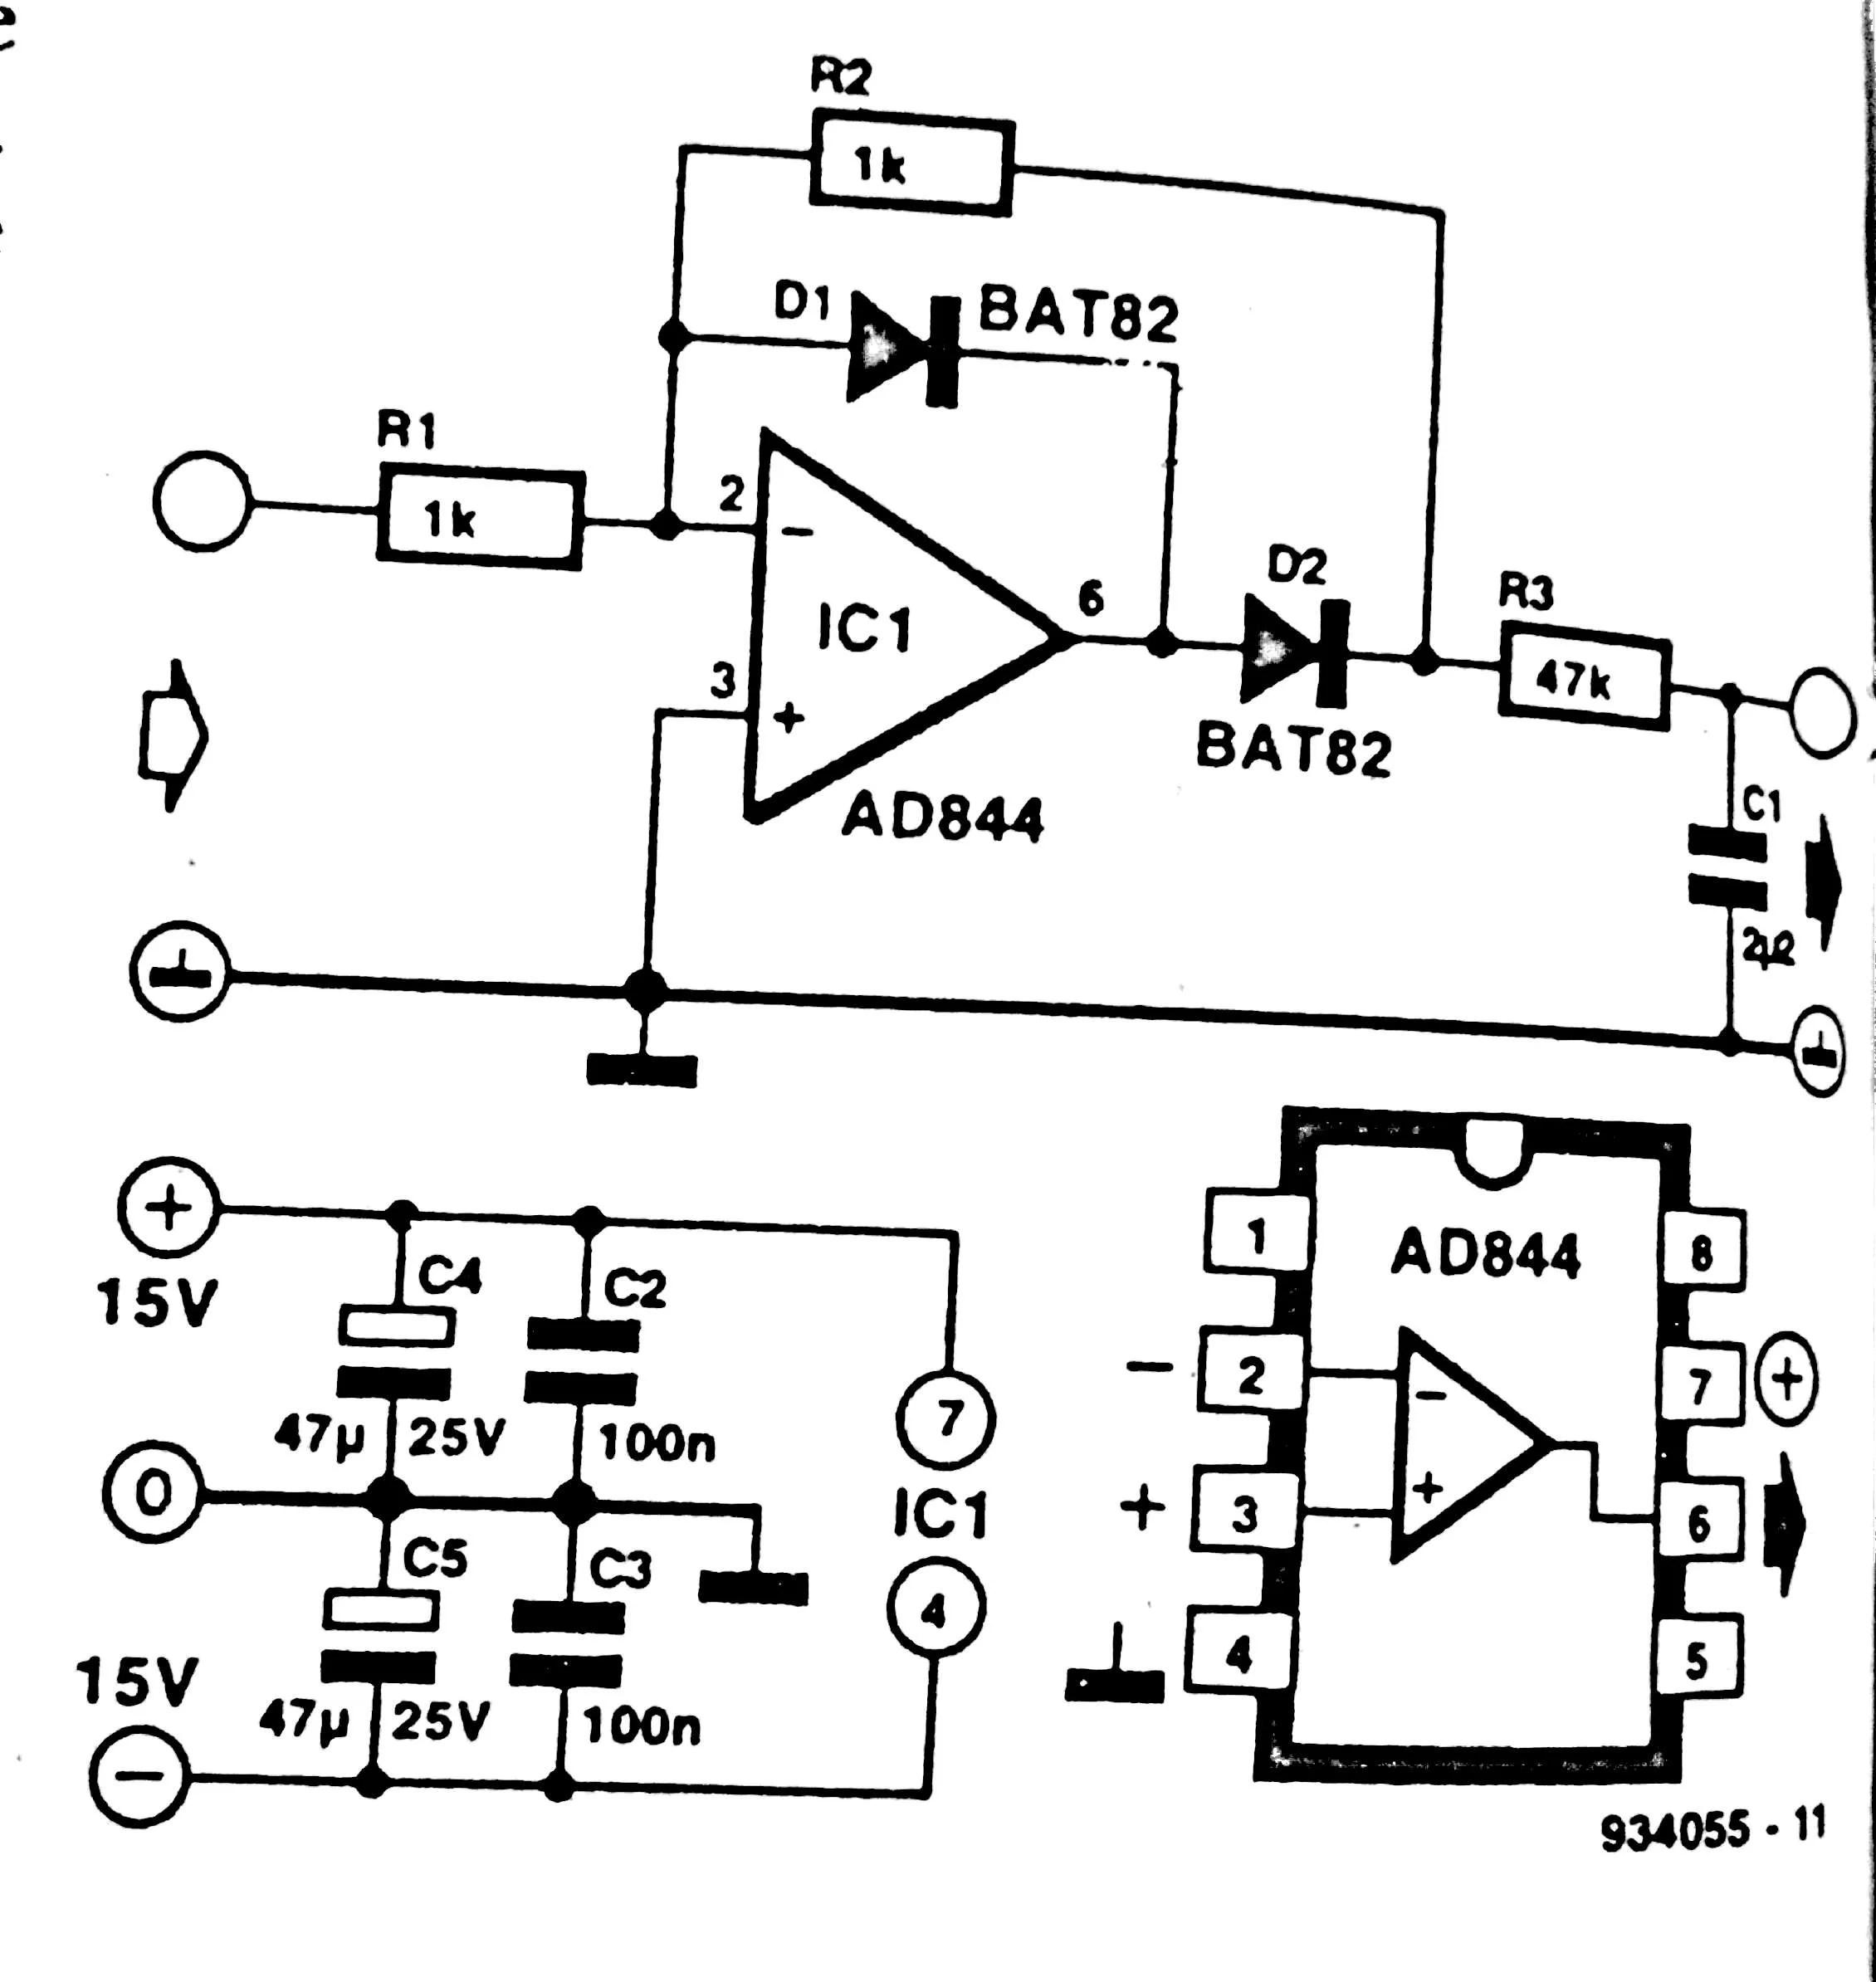 diode wiring diagram yamaha warrior 350 carburetor fast active rectifier circuit